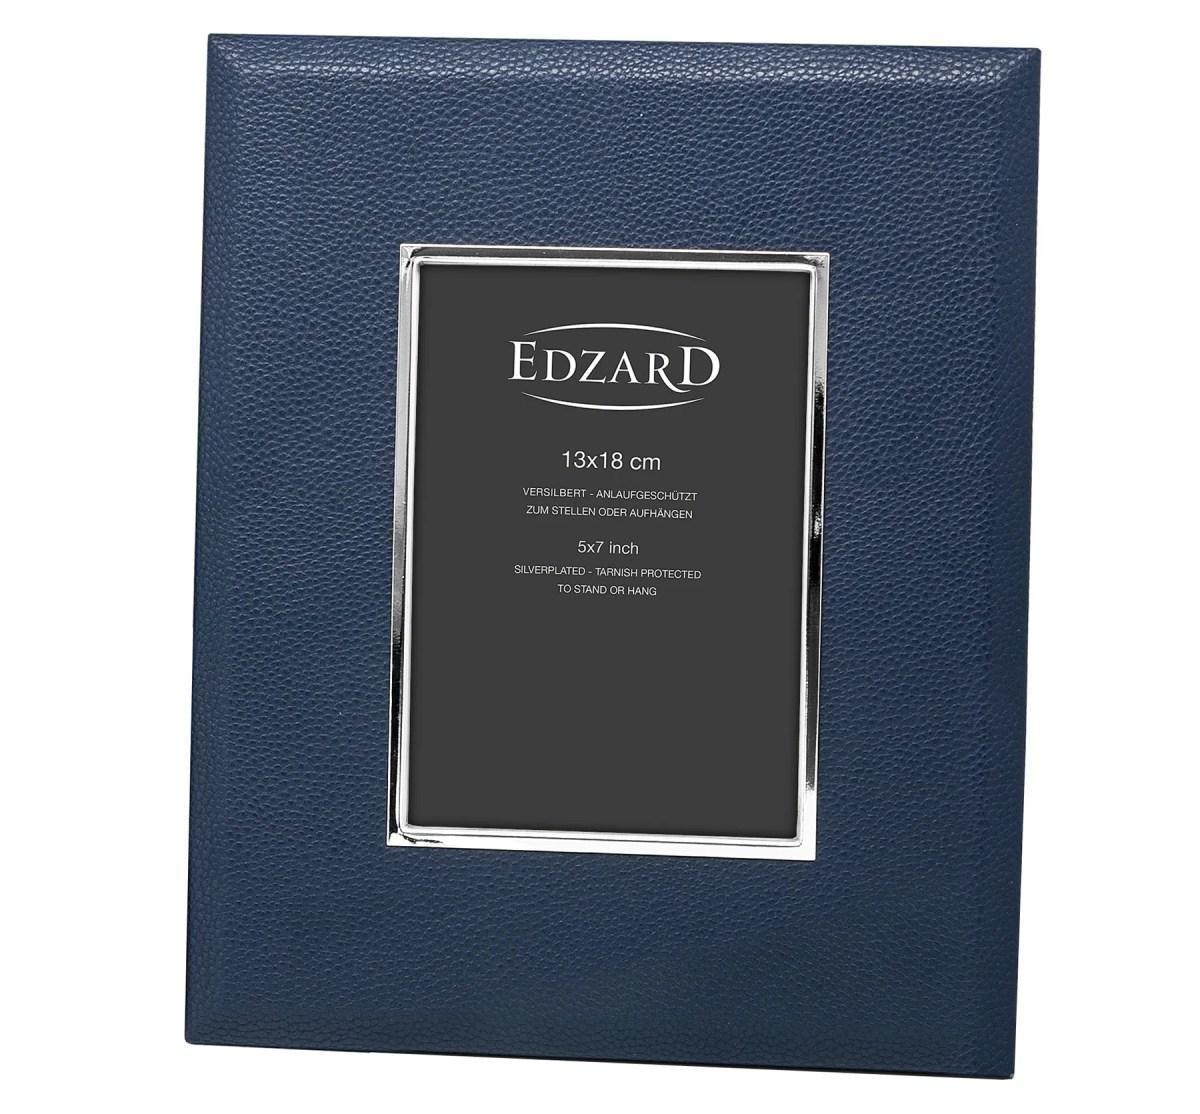 2906 Edzard Fotorahmen Bilderrahmen Bert 13 x 18 cm Lederoptik dunkelblau Versilbert